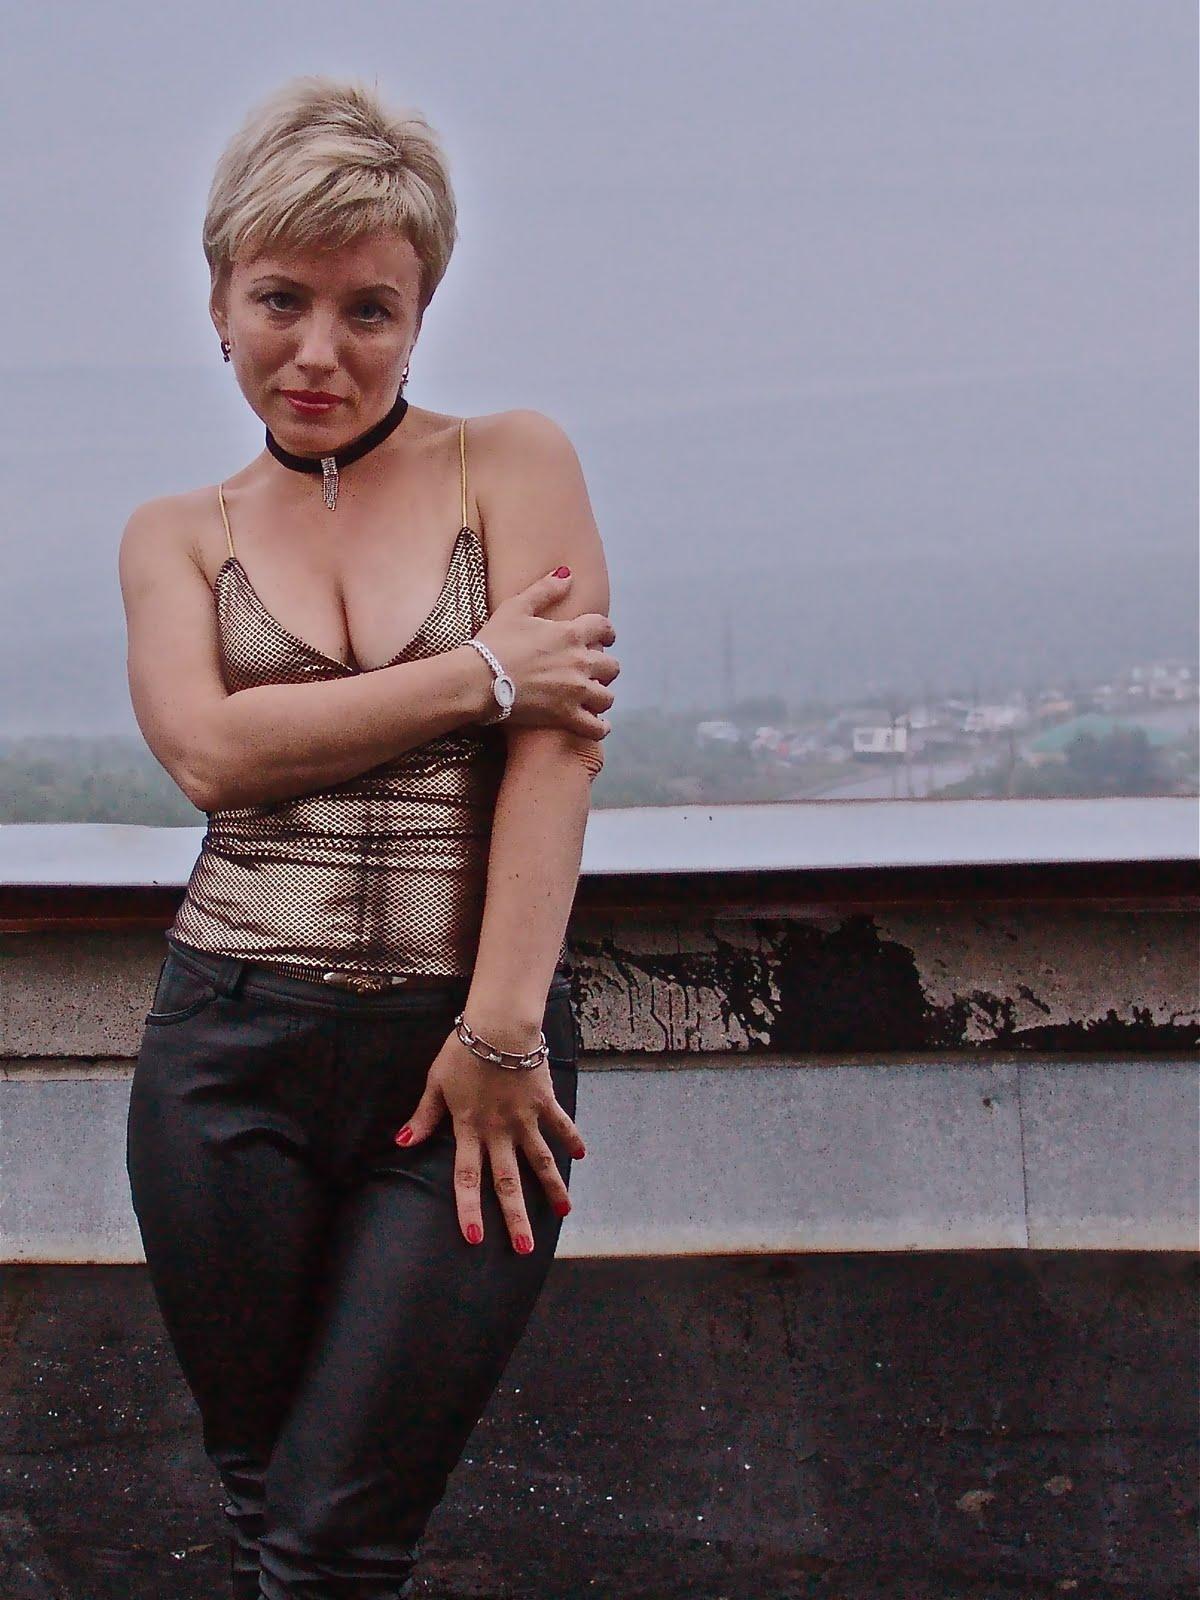 Порно ролики бесплатно девочки в латексе коже